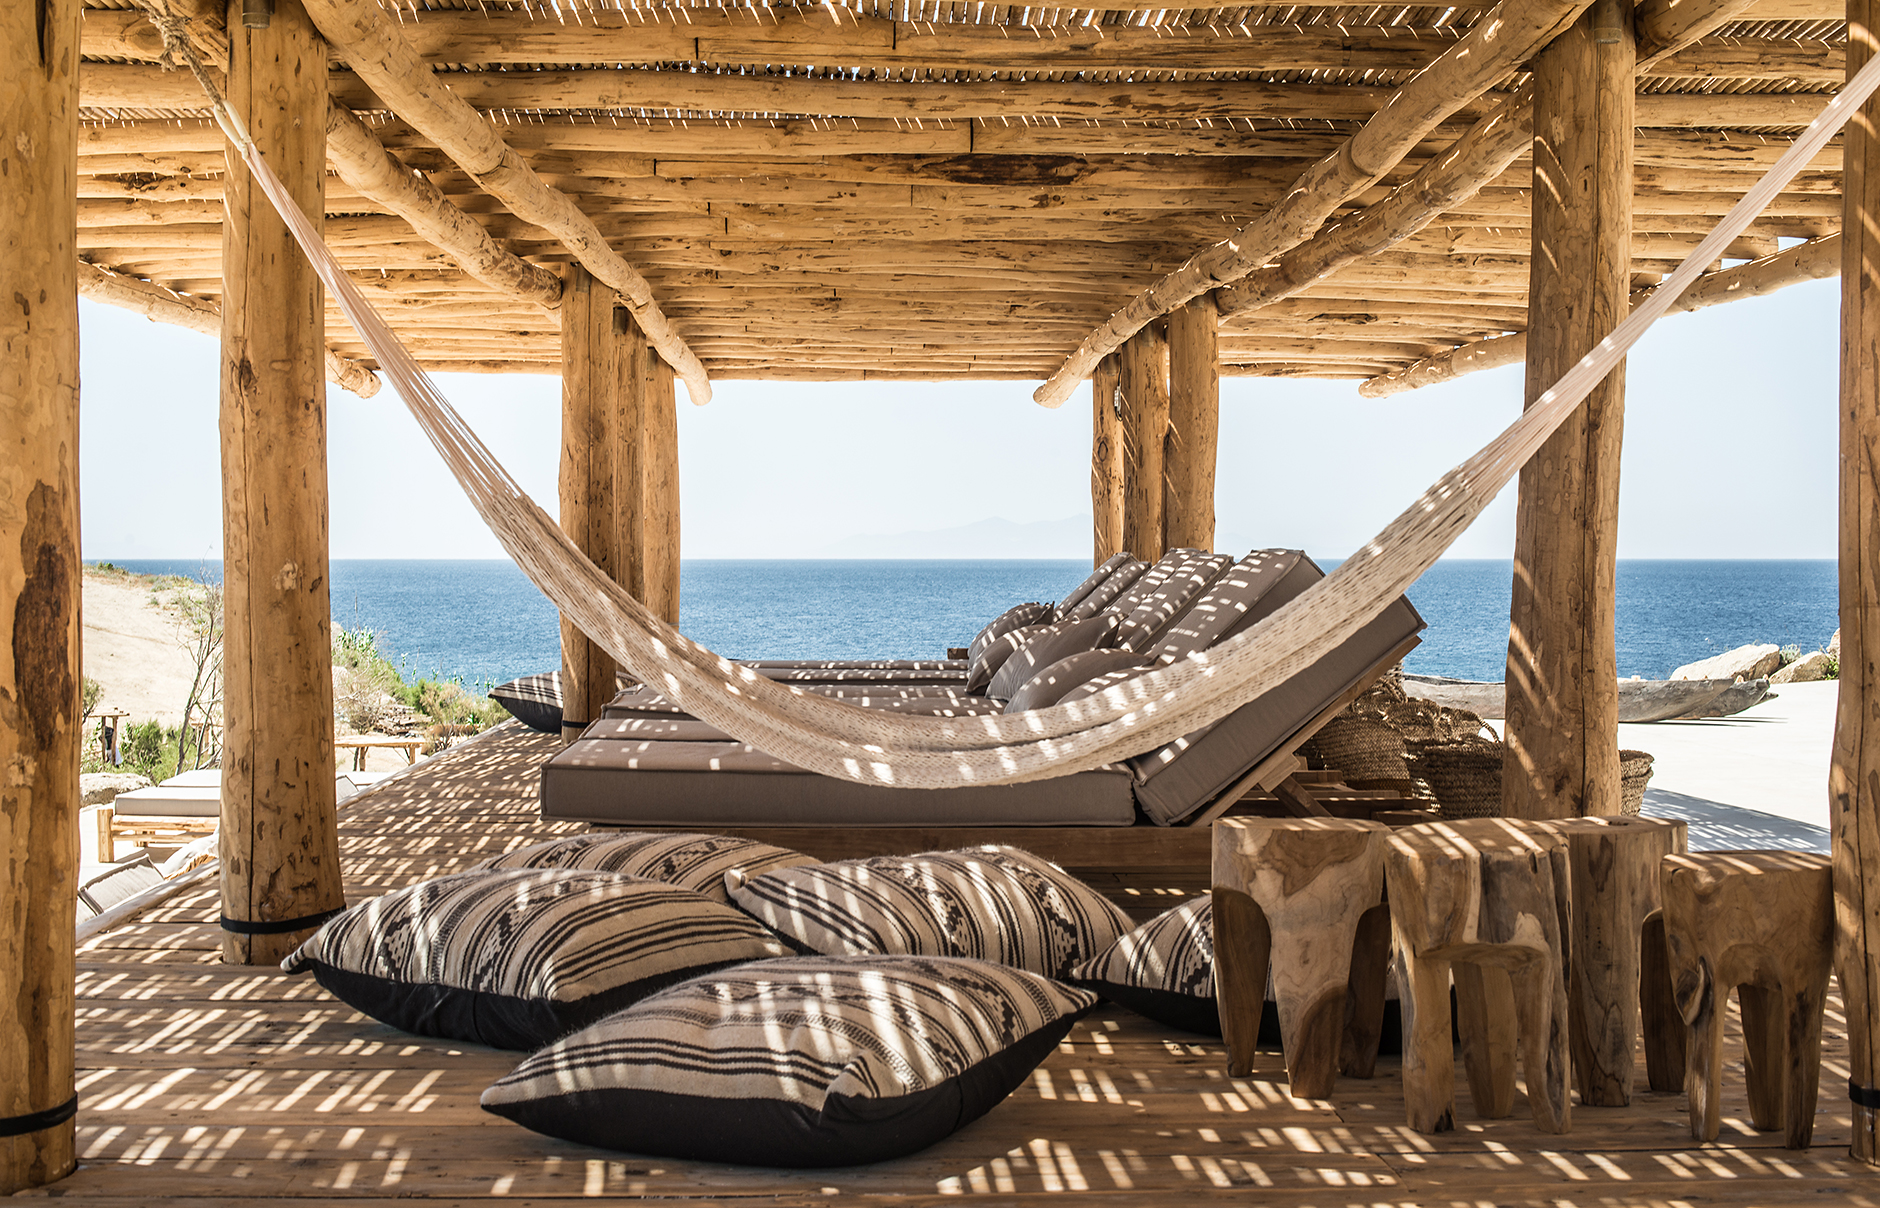 The Best Beach Bars in Mykonos - Starlight Mykonos